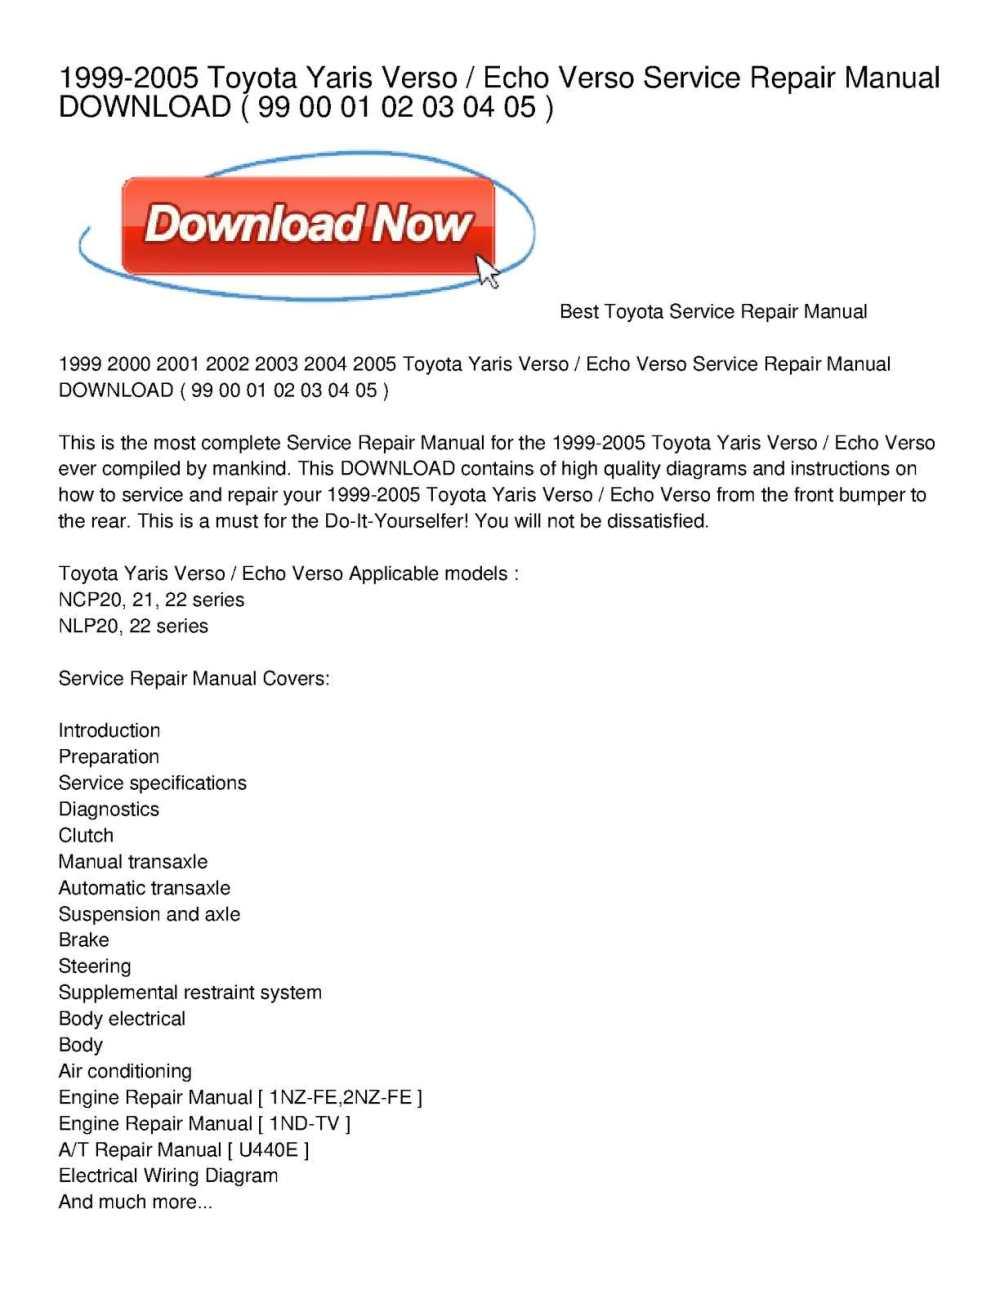 medium resolution of 1999 2005 toyota yaris verso echo verso service repair manual download